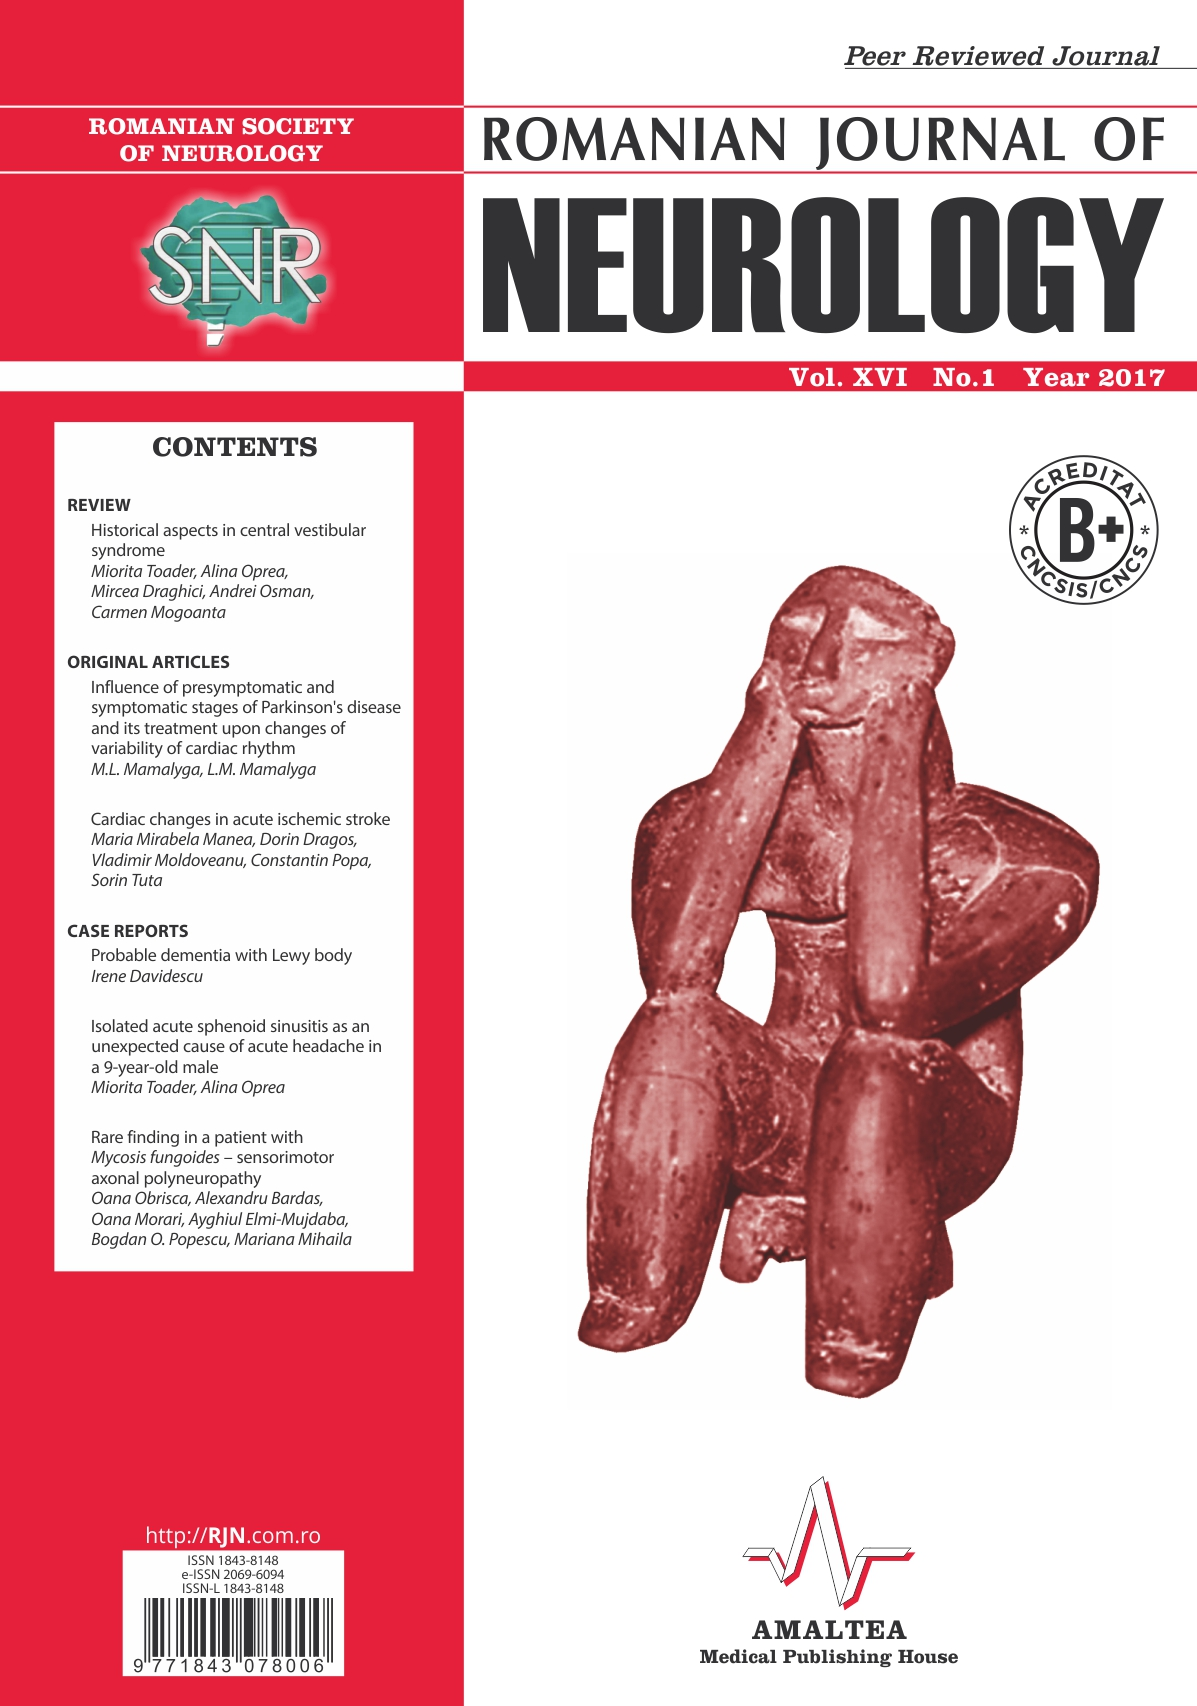 Romanian Journal of Neurology, Volume XVI, No. 1, 2017